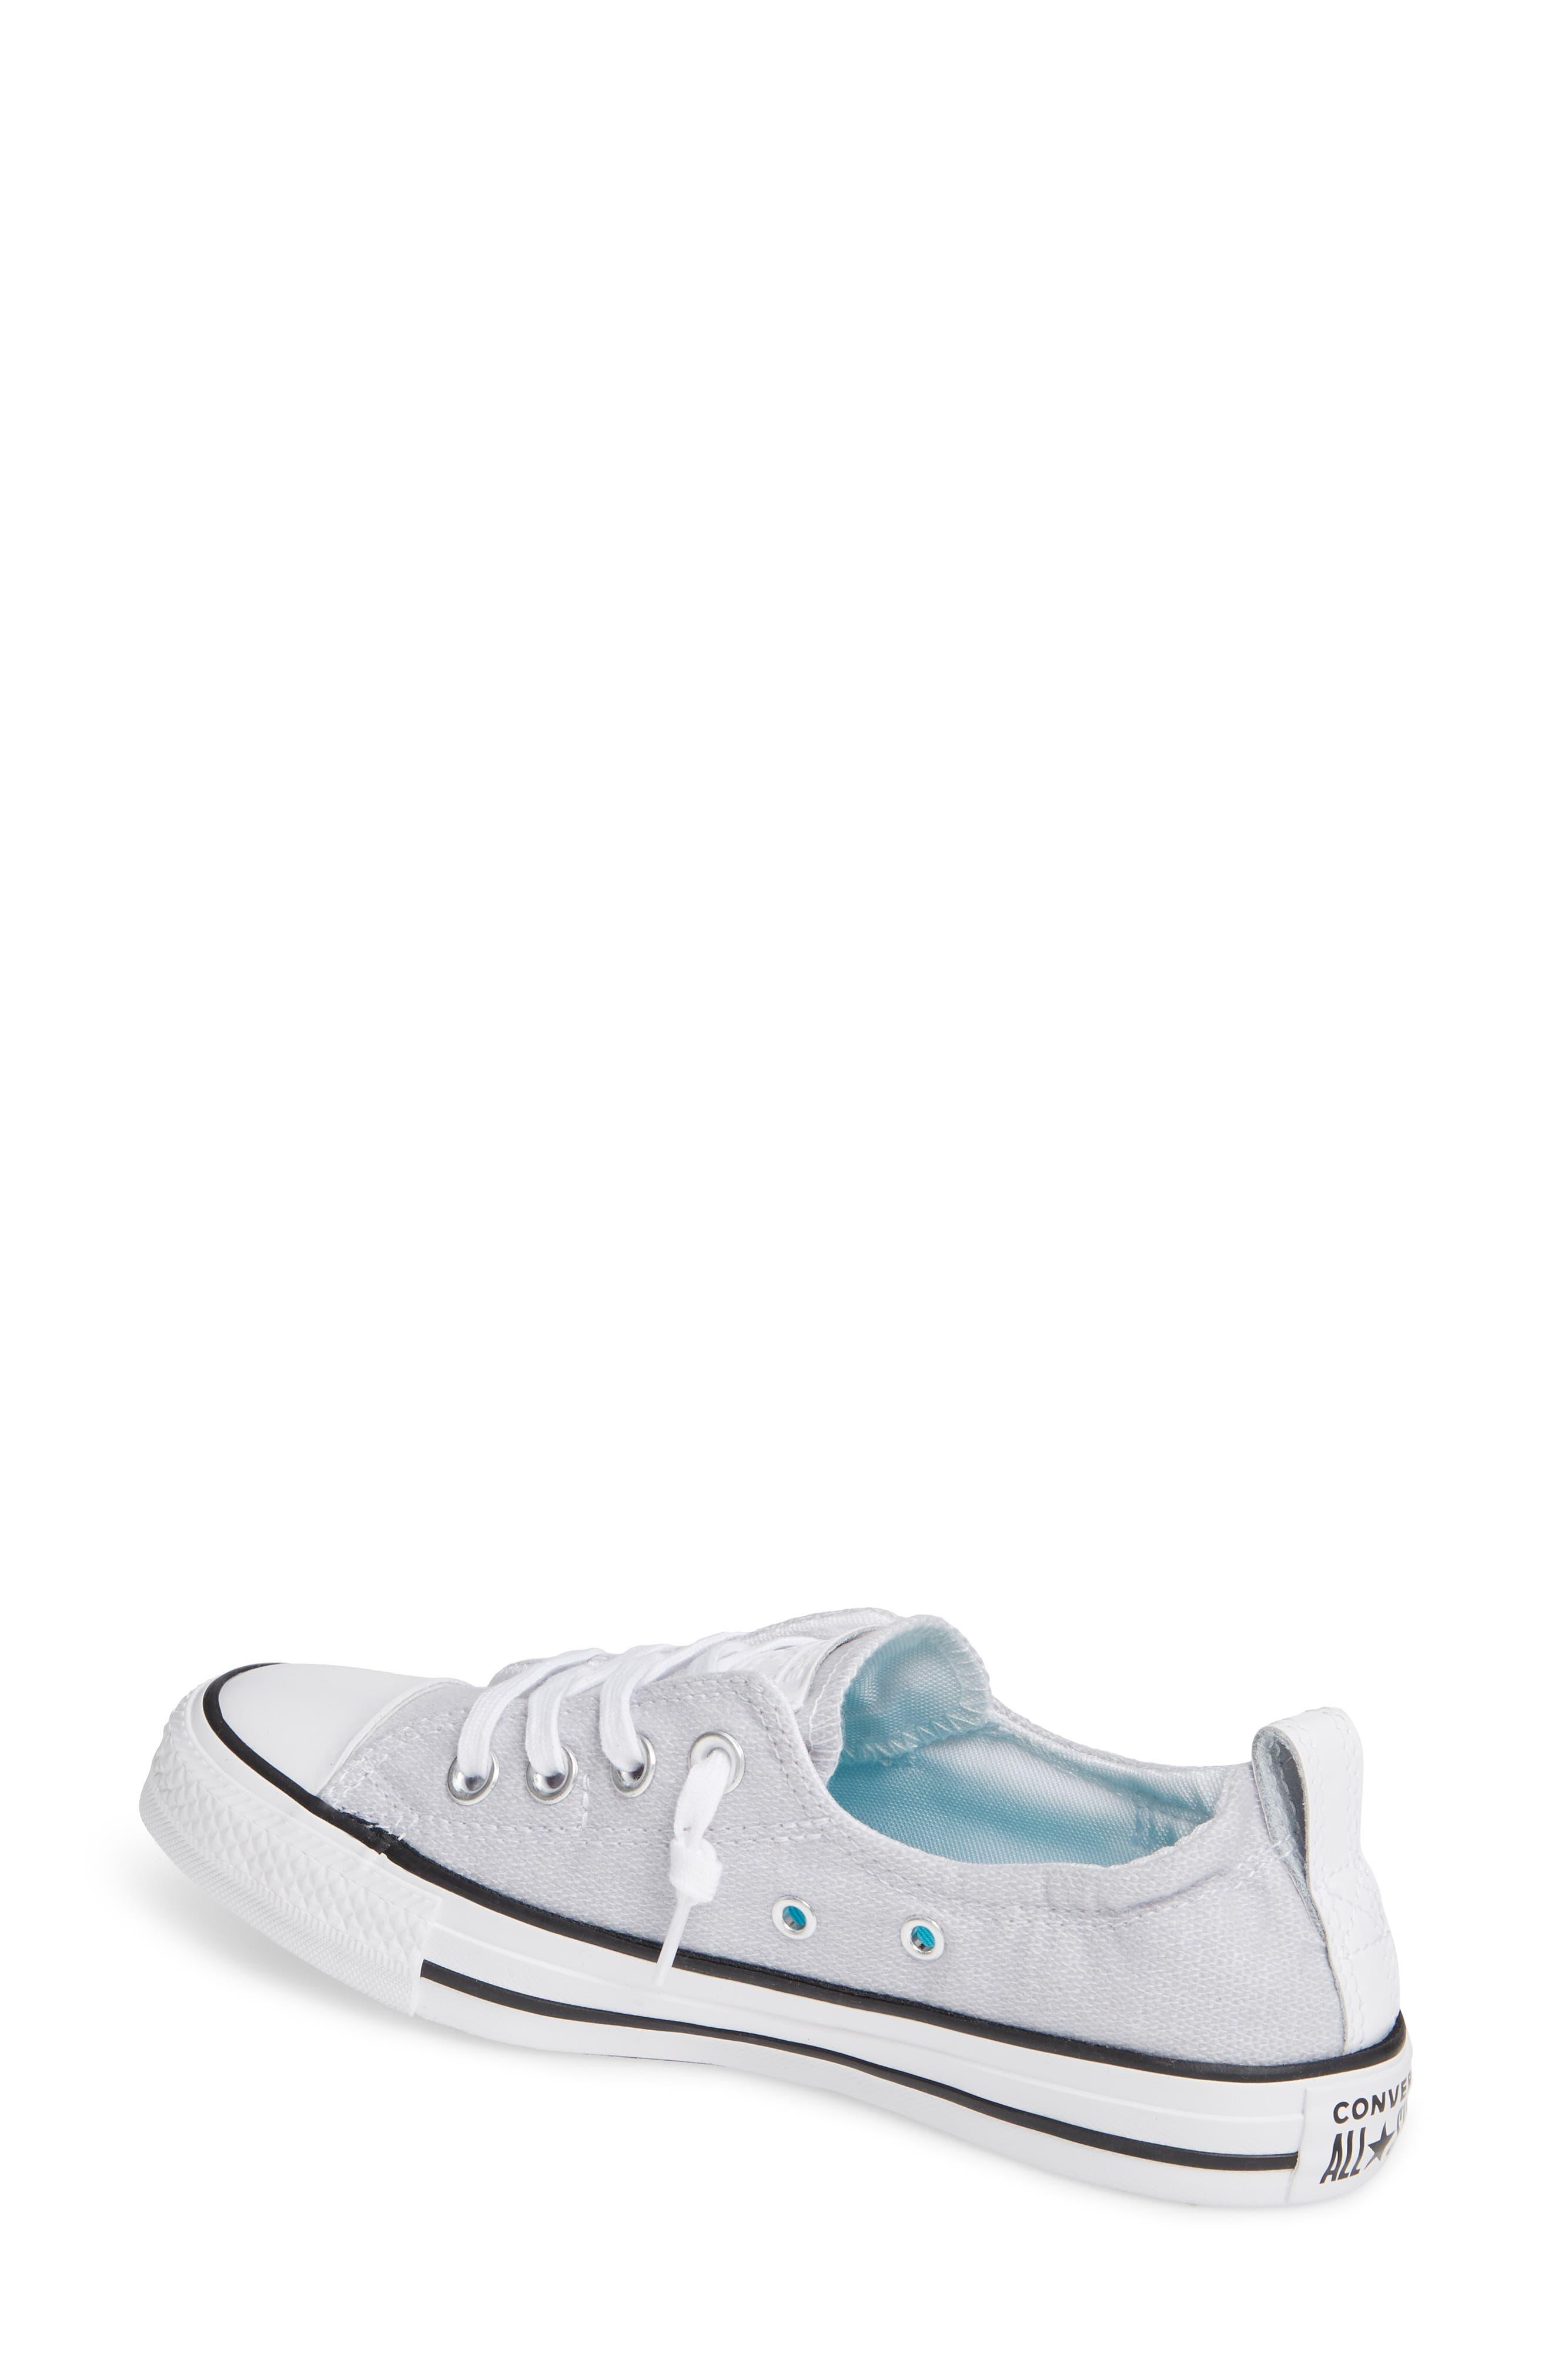 CONVERSE, Chuck Taylor<sup>®</sup> 'Shoreline' Sneaker, Alternate thumbnail 2, color, WHITE